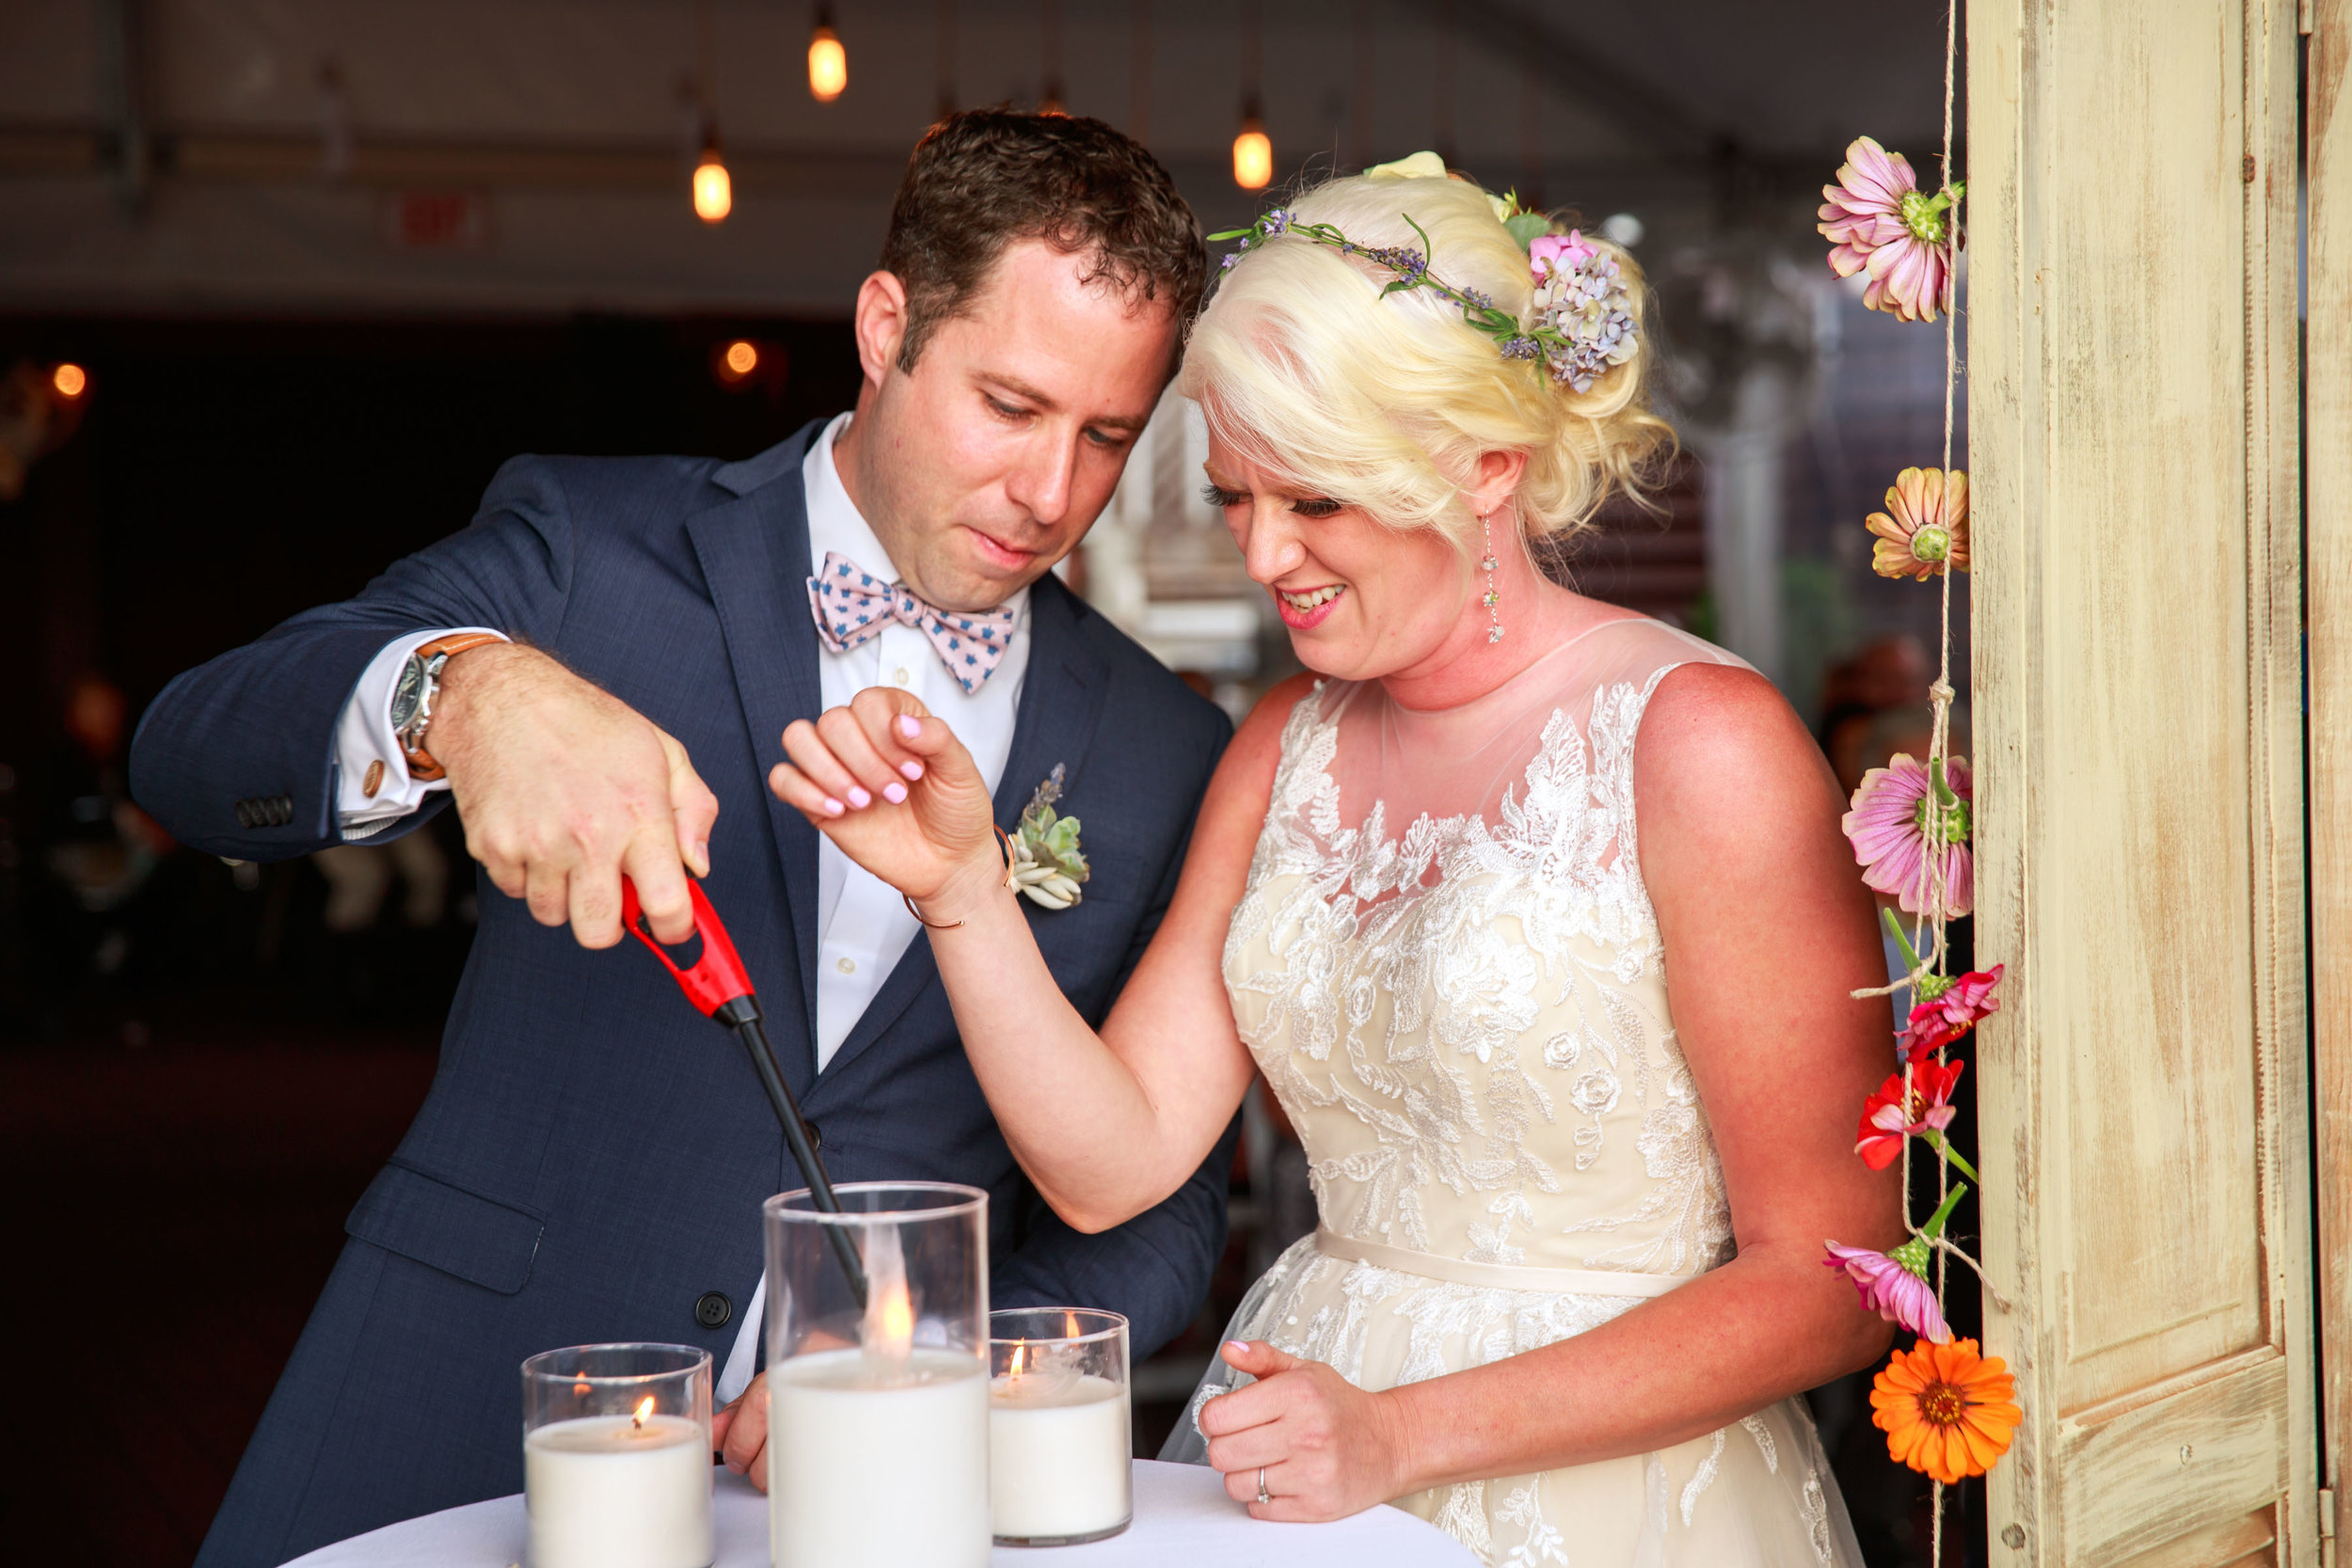 128-South-Wedding-Wilmington-NC-Photographer-Ceremony-18.jpg